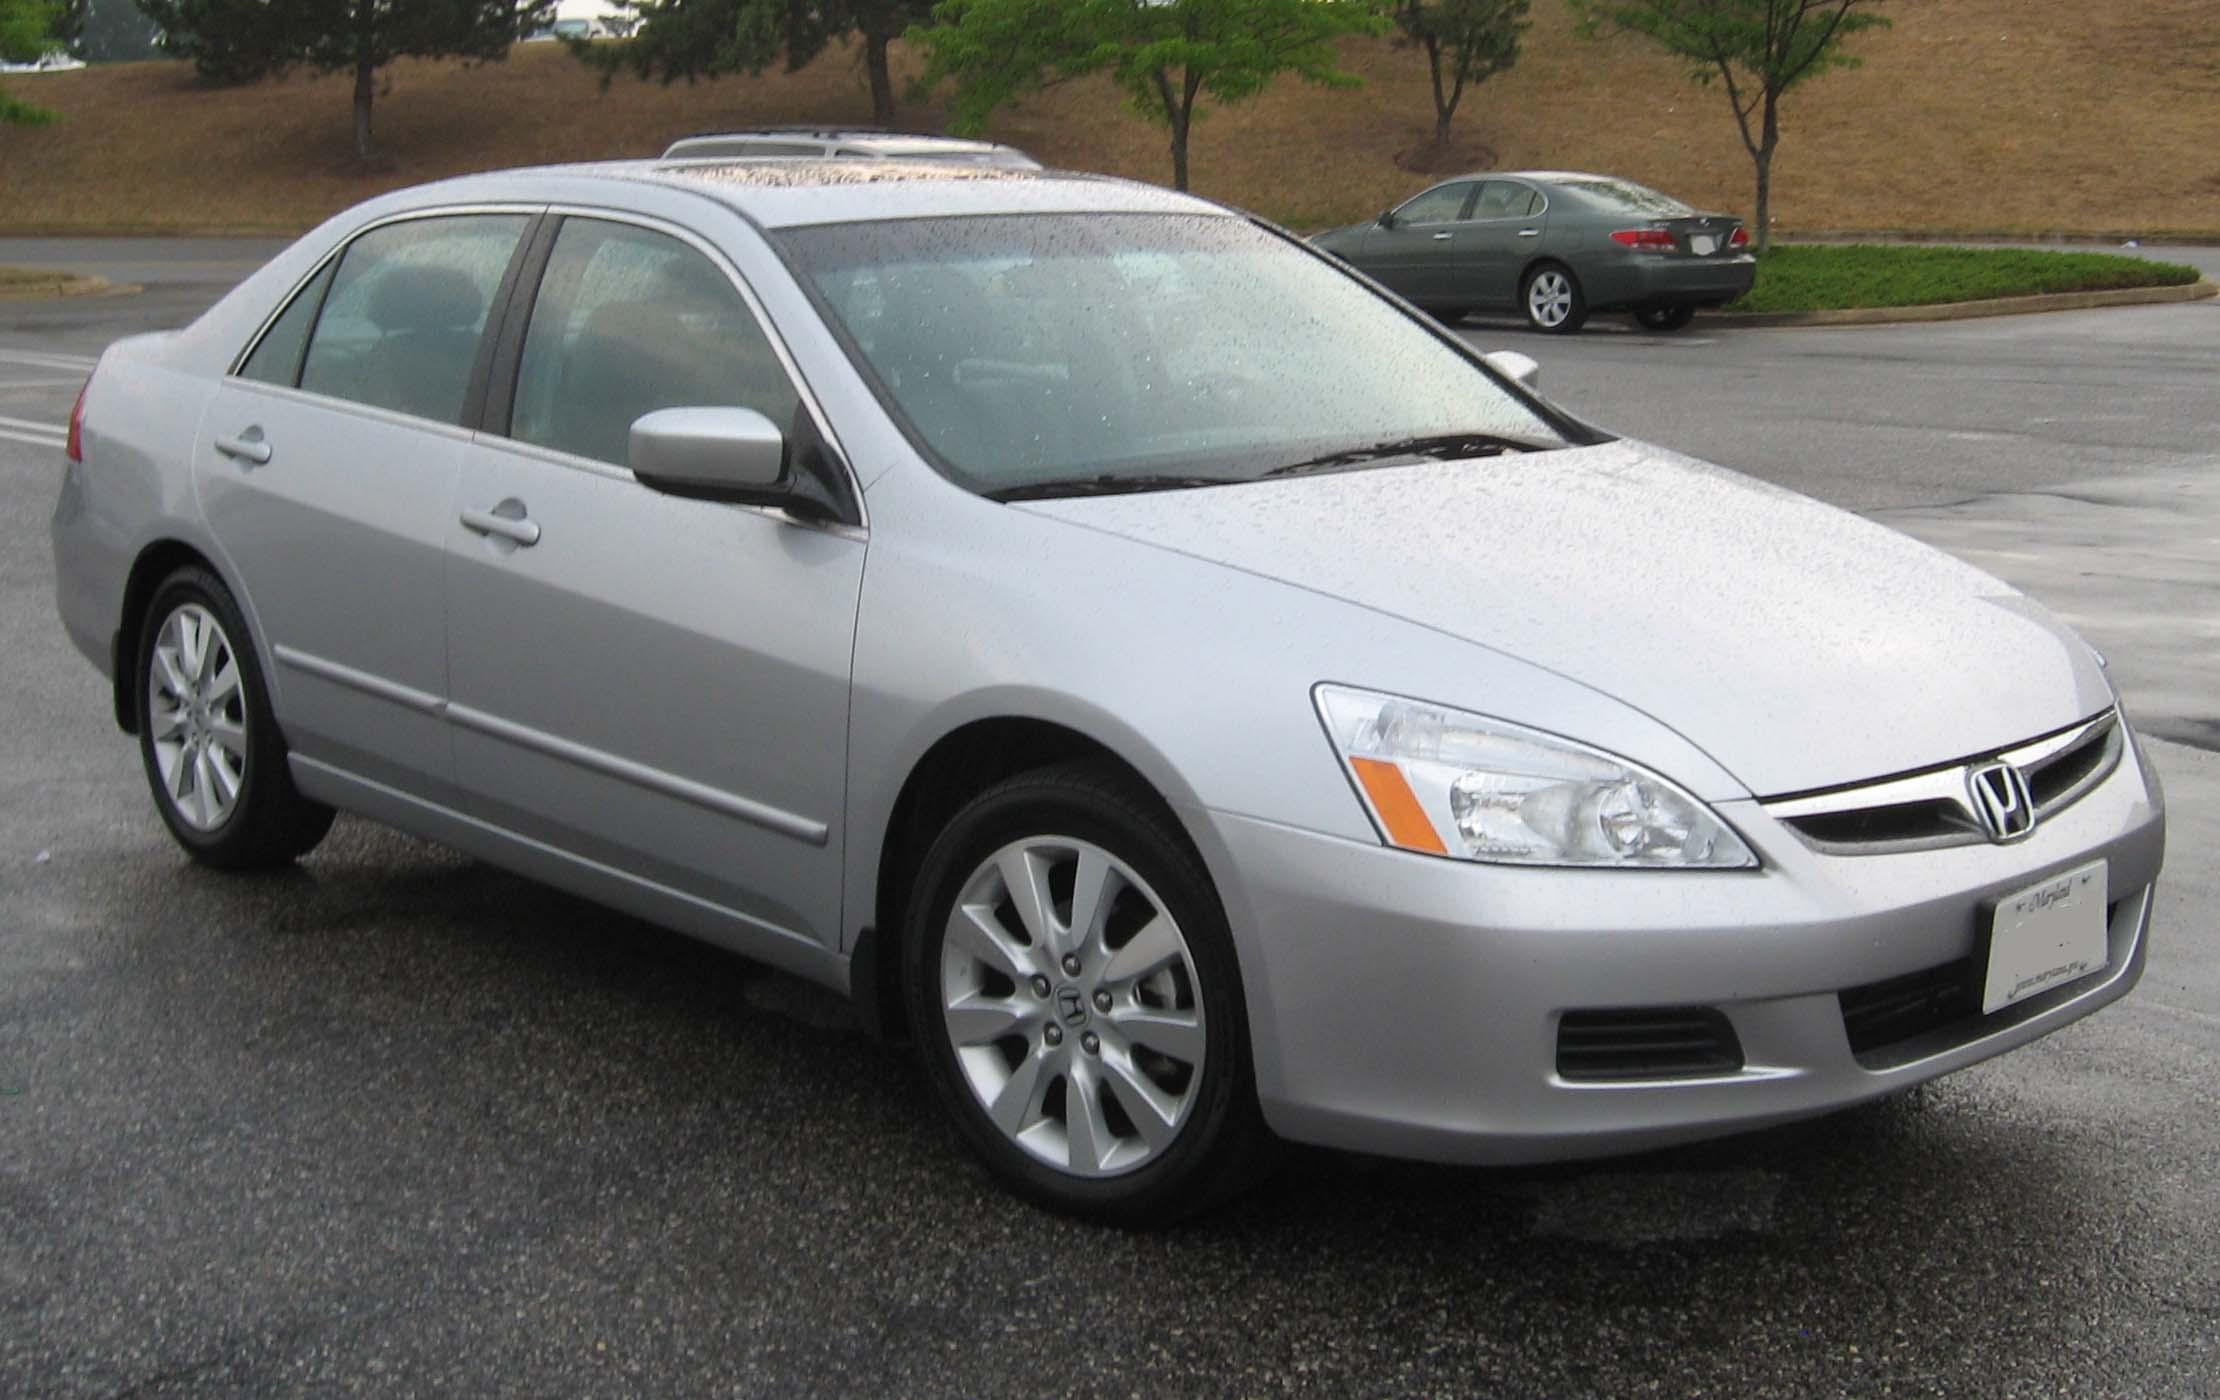 2006 Honda Accord Information And Photos Zombiedrive